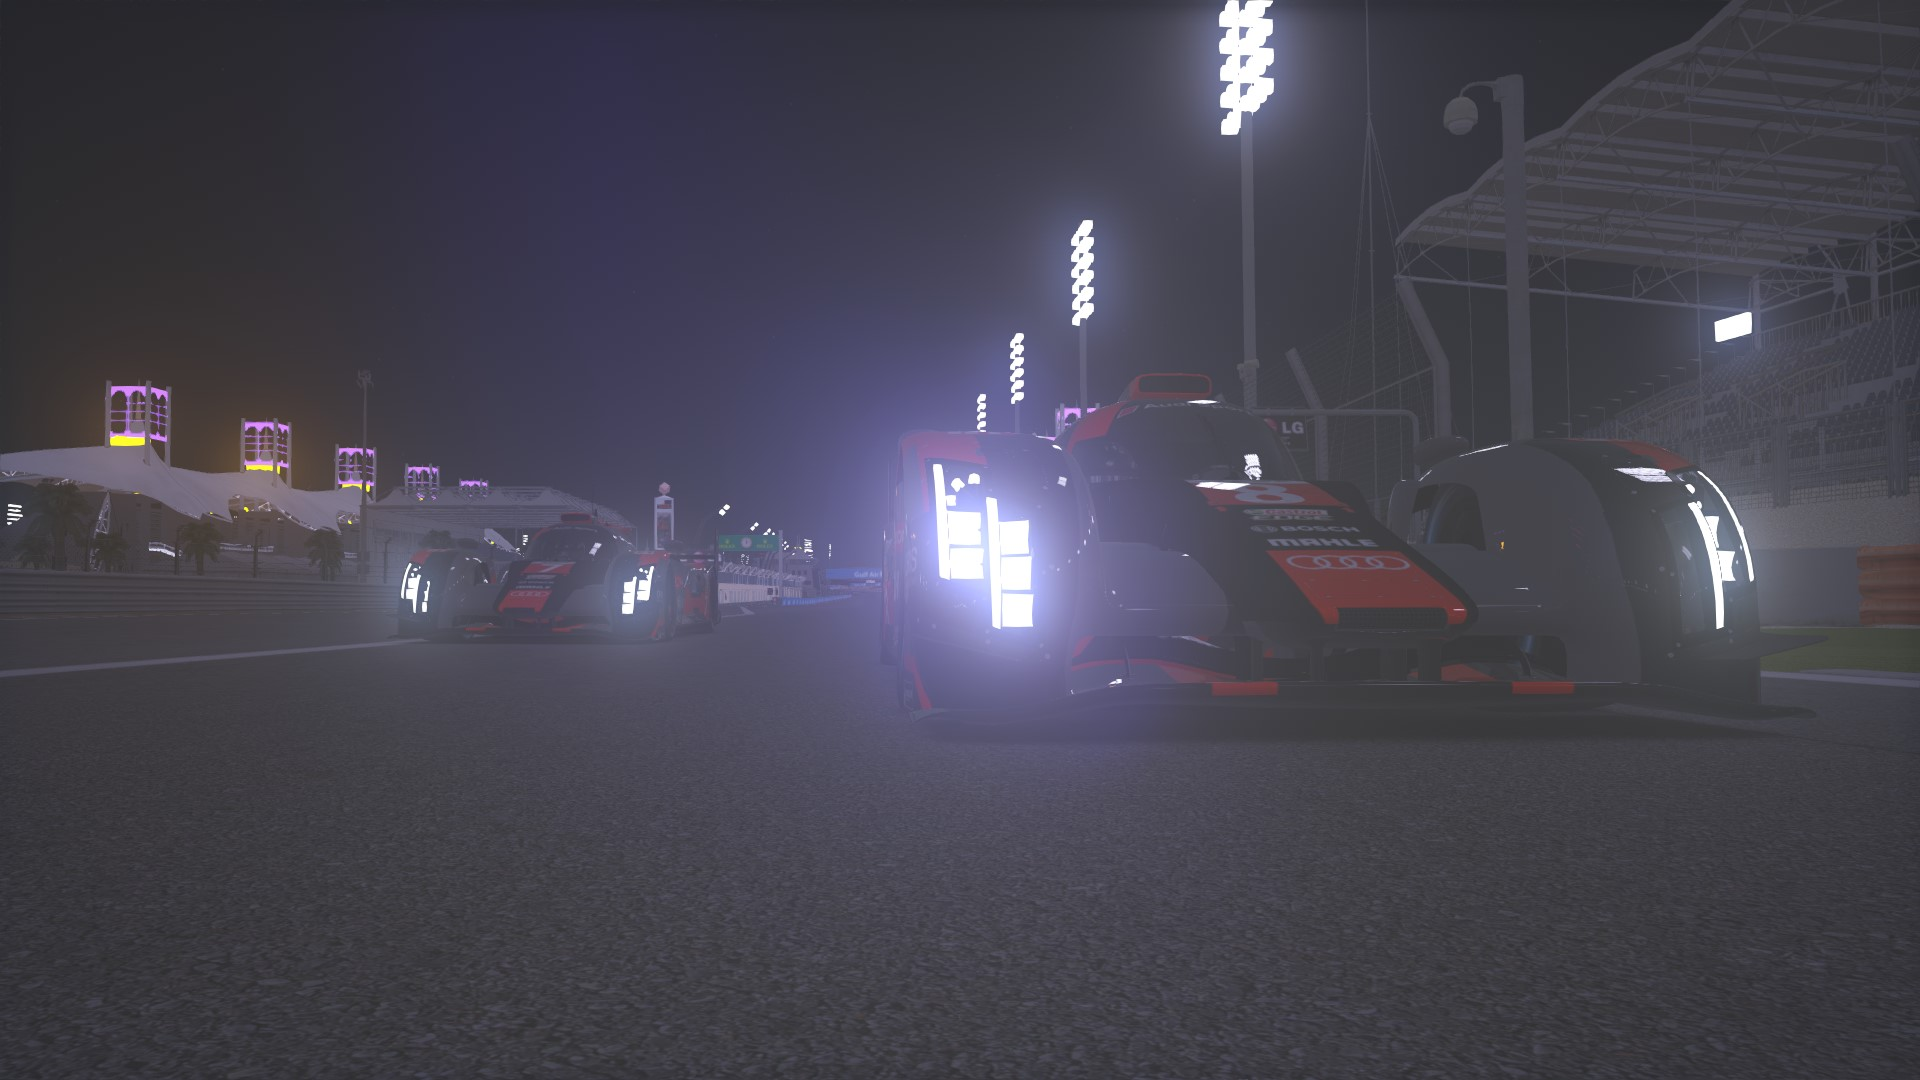 Screenshot_ks_audi_r18_etron_quattro_bahrain_night_6-8-117-12-0-55.jpg